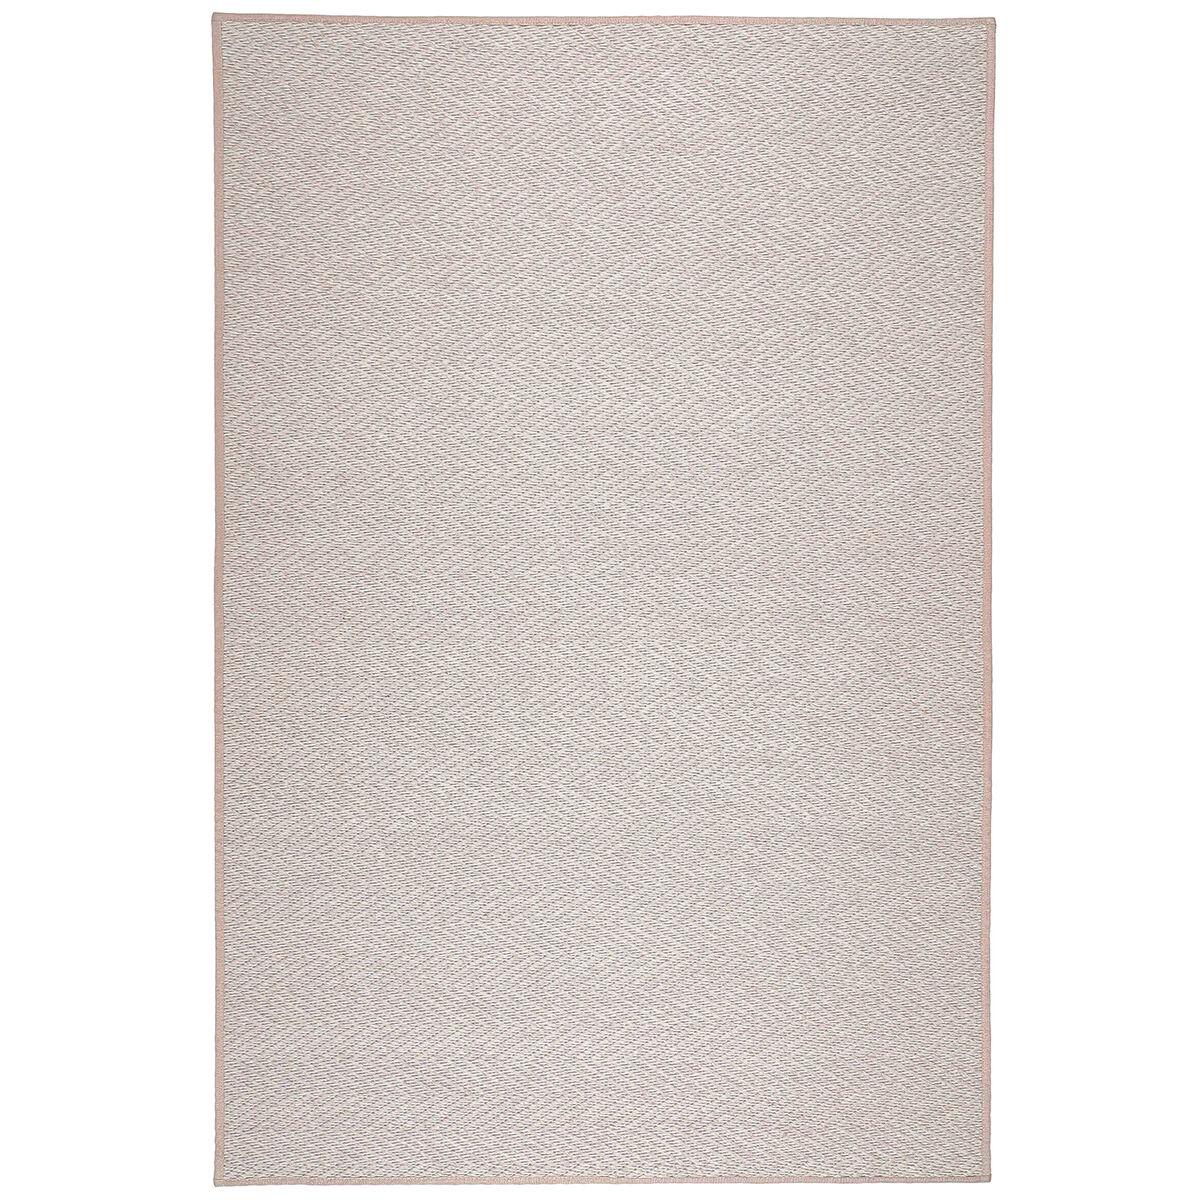 VM Carpet Elsa matto, beige